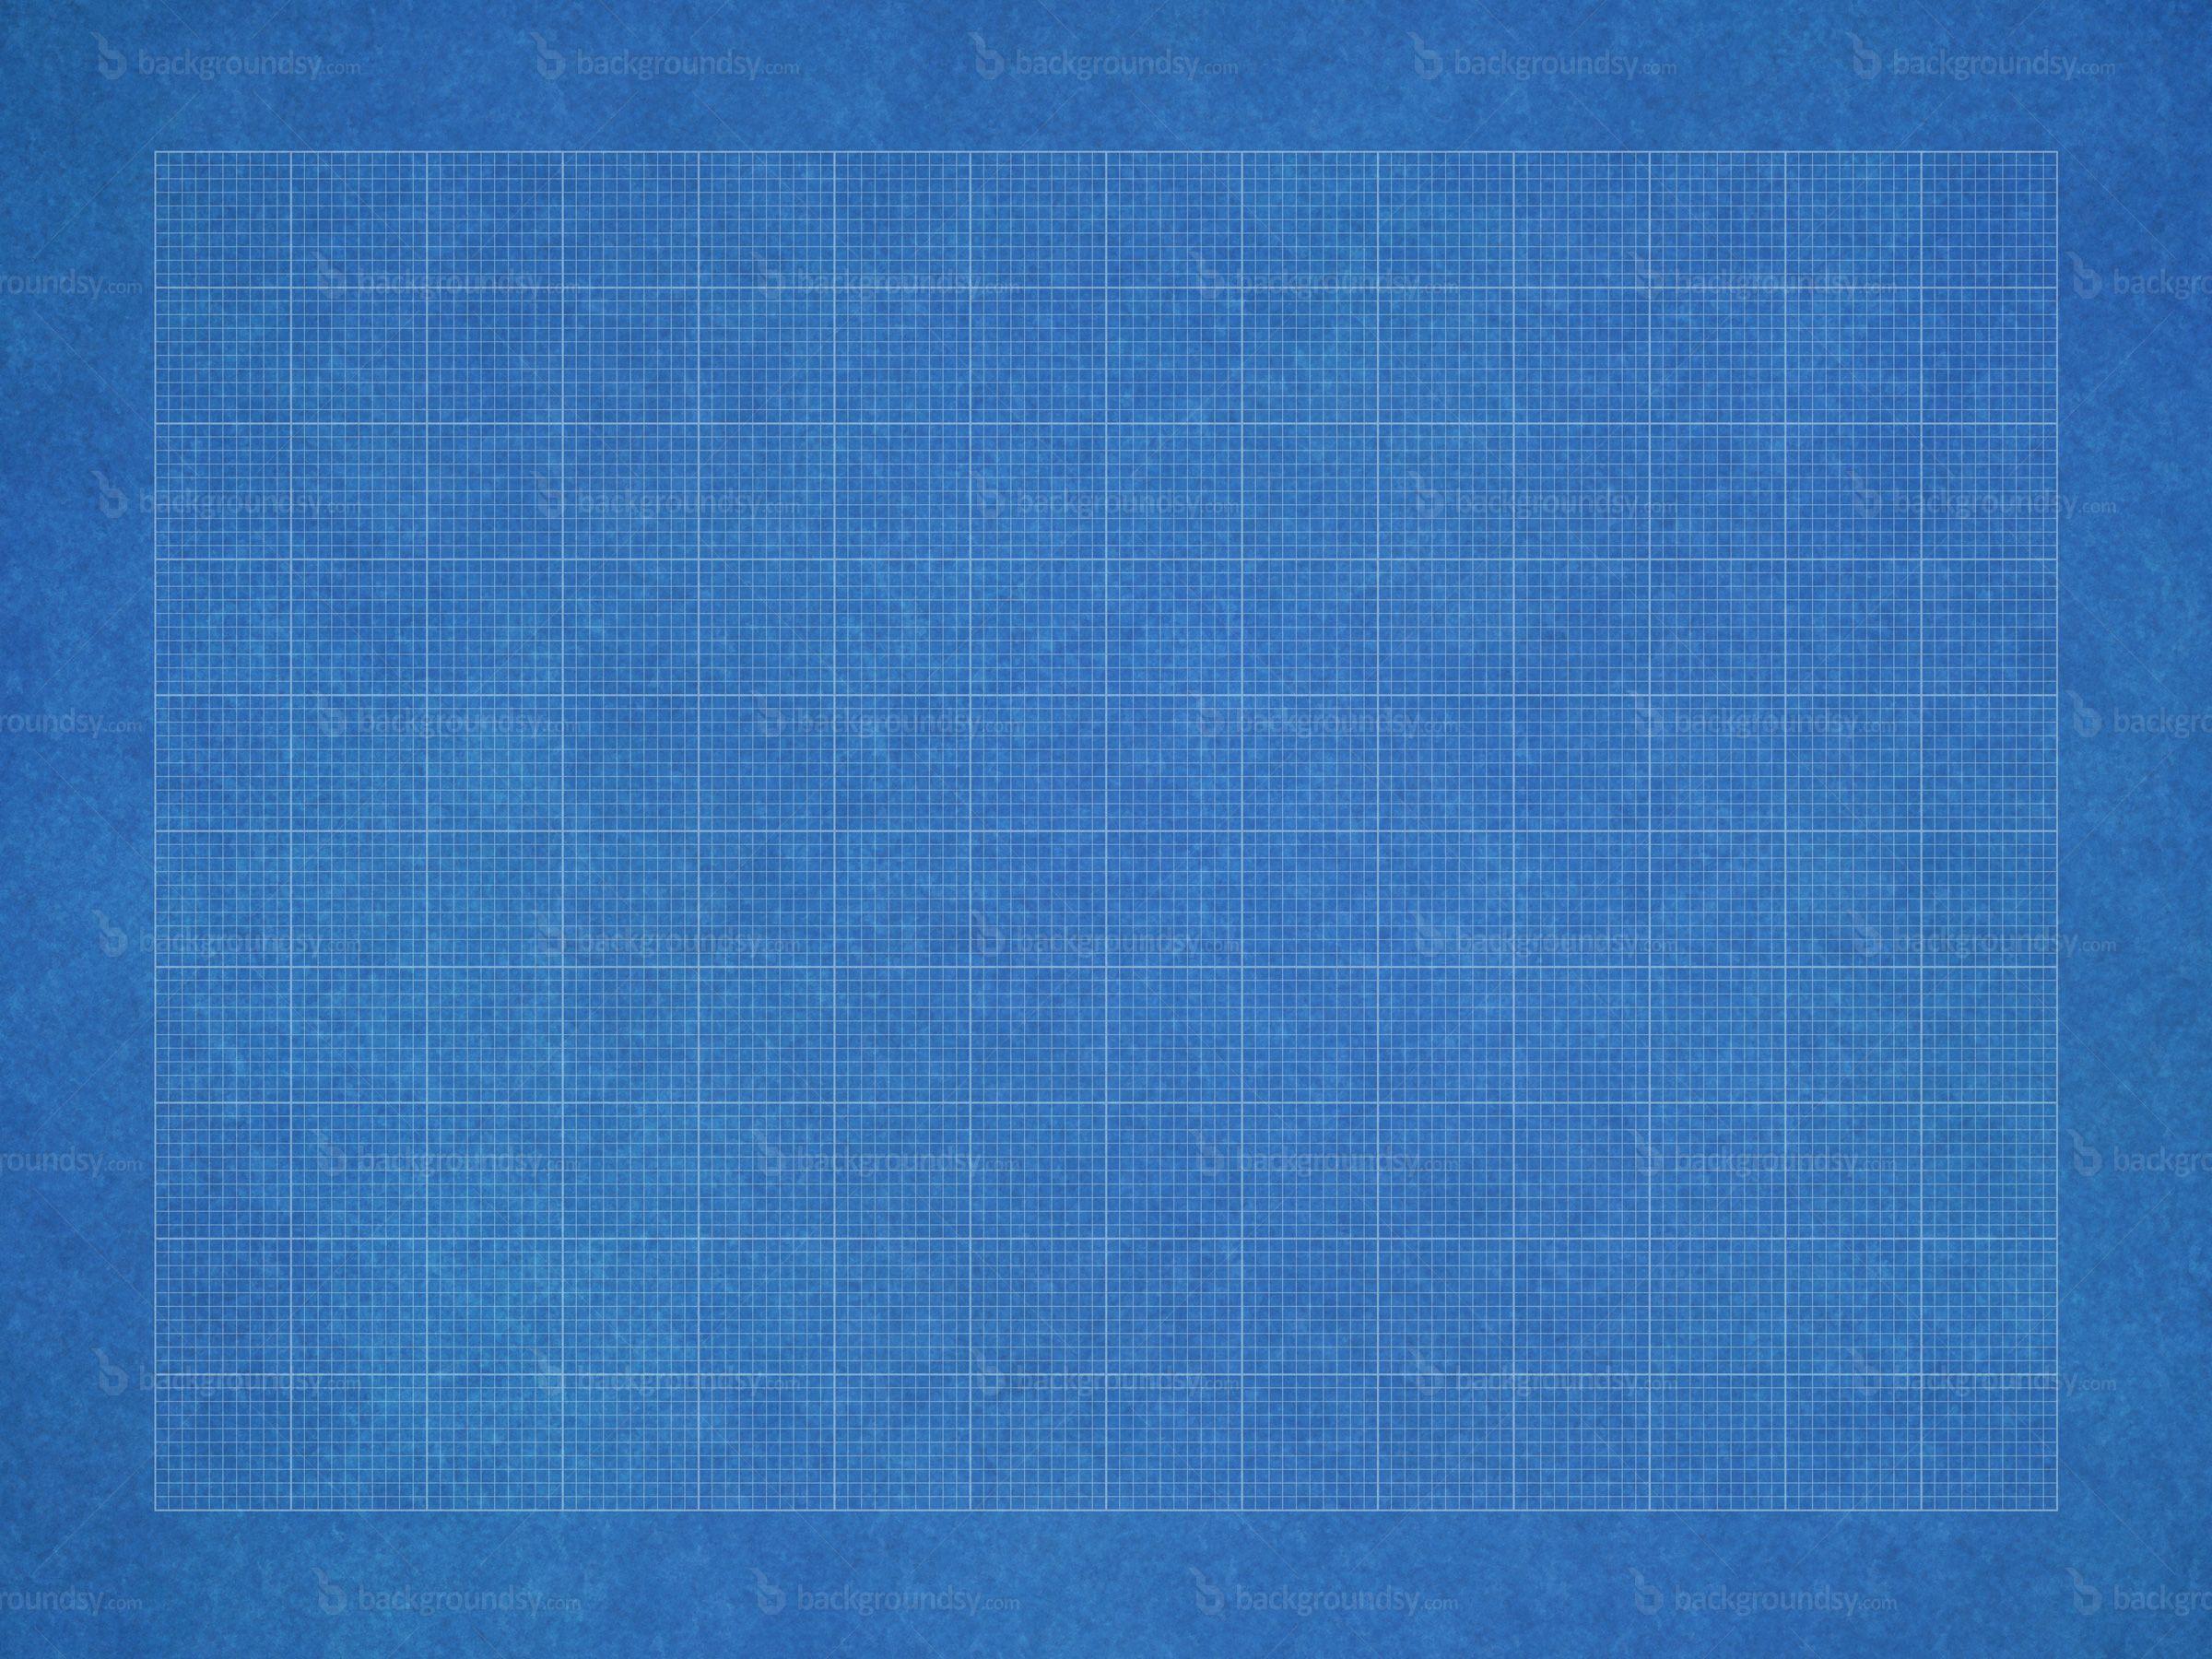 Blueprint graph paper idealstalist blueprint graph paper malvernweather Choice Image